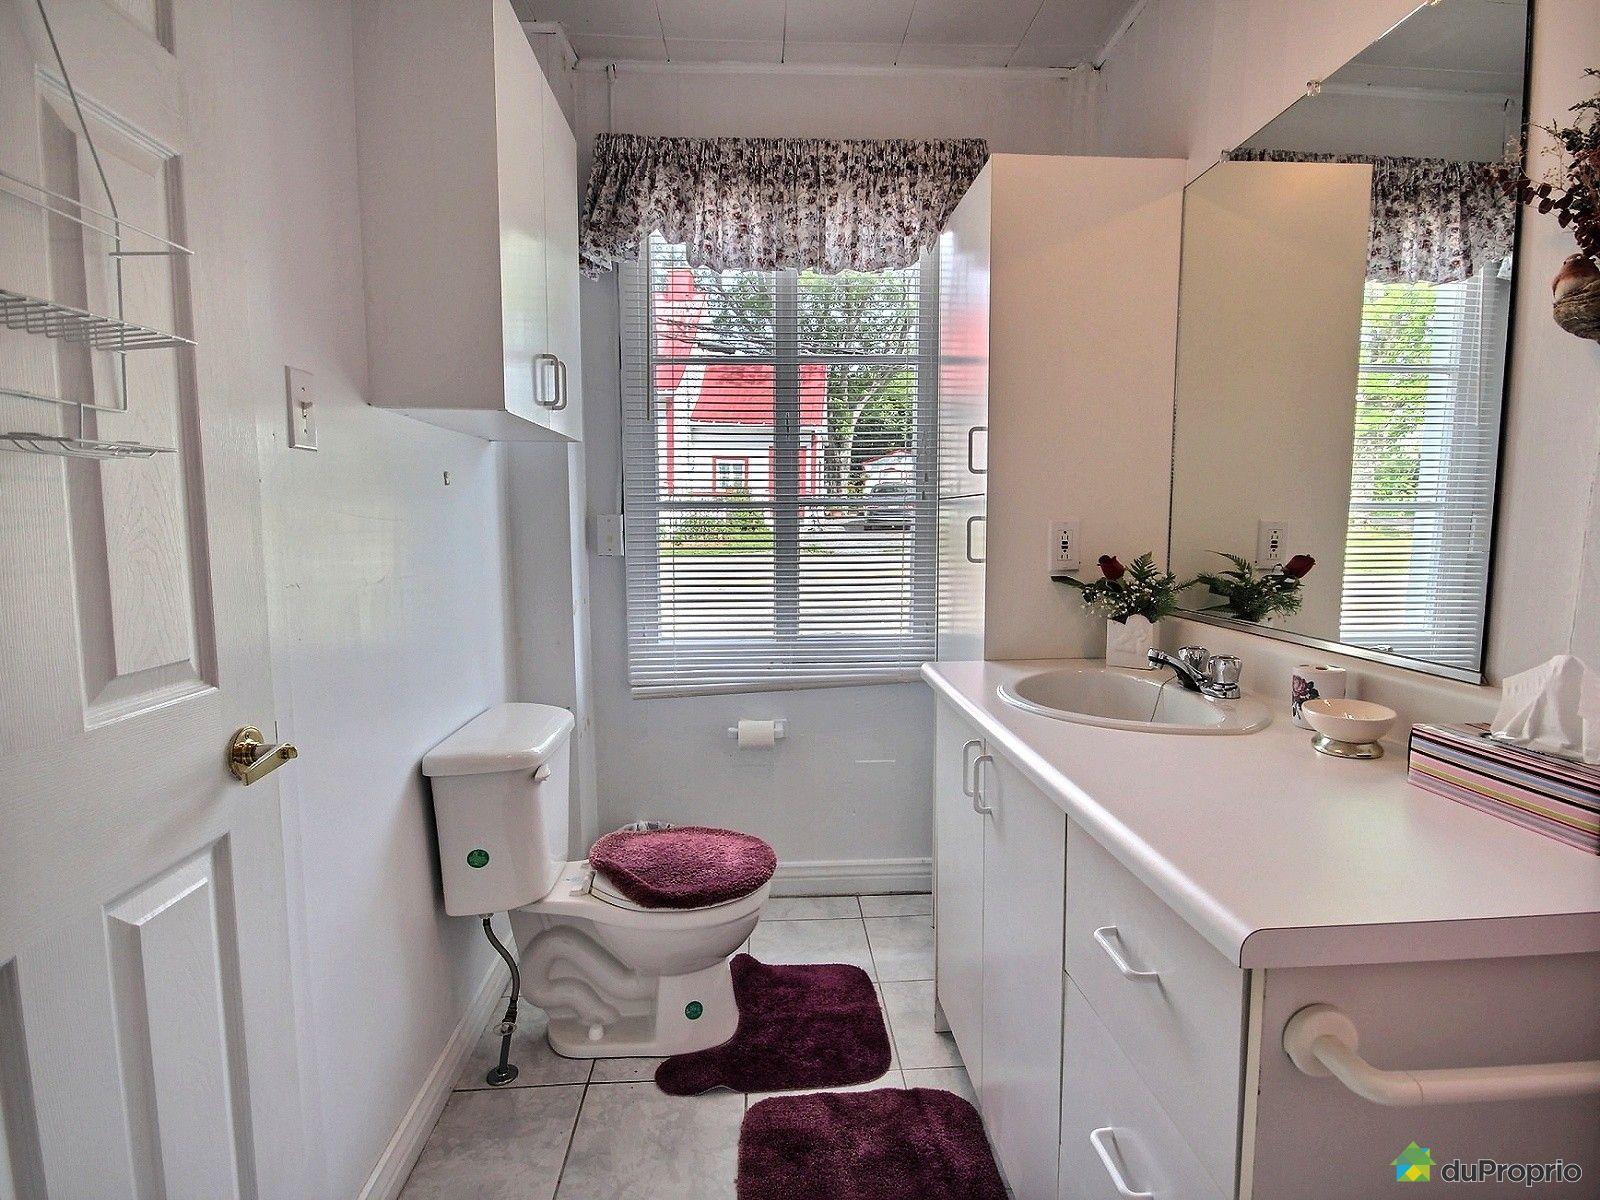 maison vendre ile d 39 orleans st jean 2214 chemin royal immobilier qu bec duproprio 532081. Black Bedroom Furniture Sets. Home Design Ideas